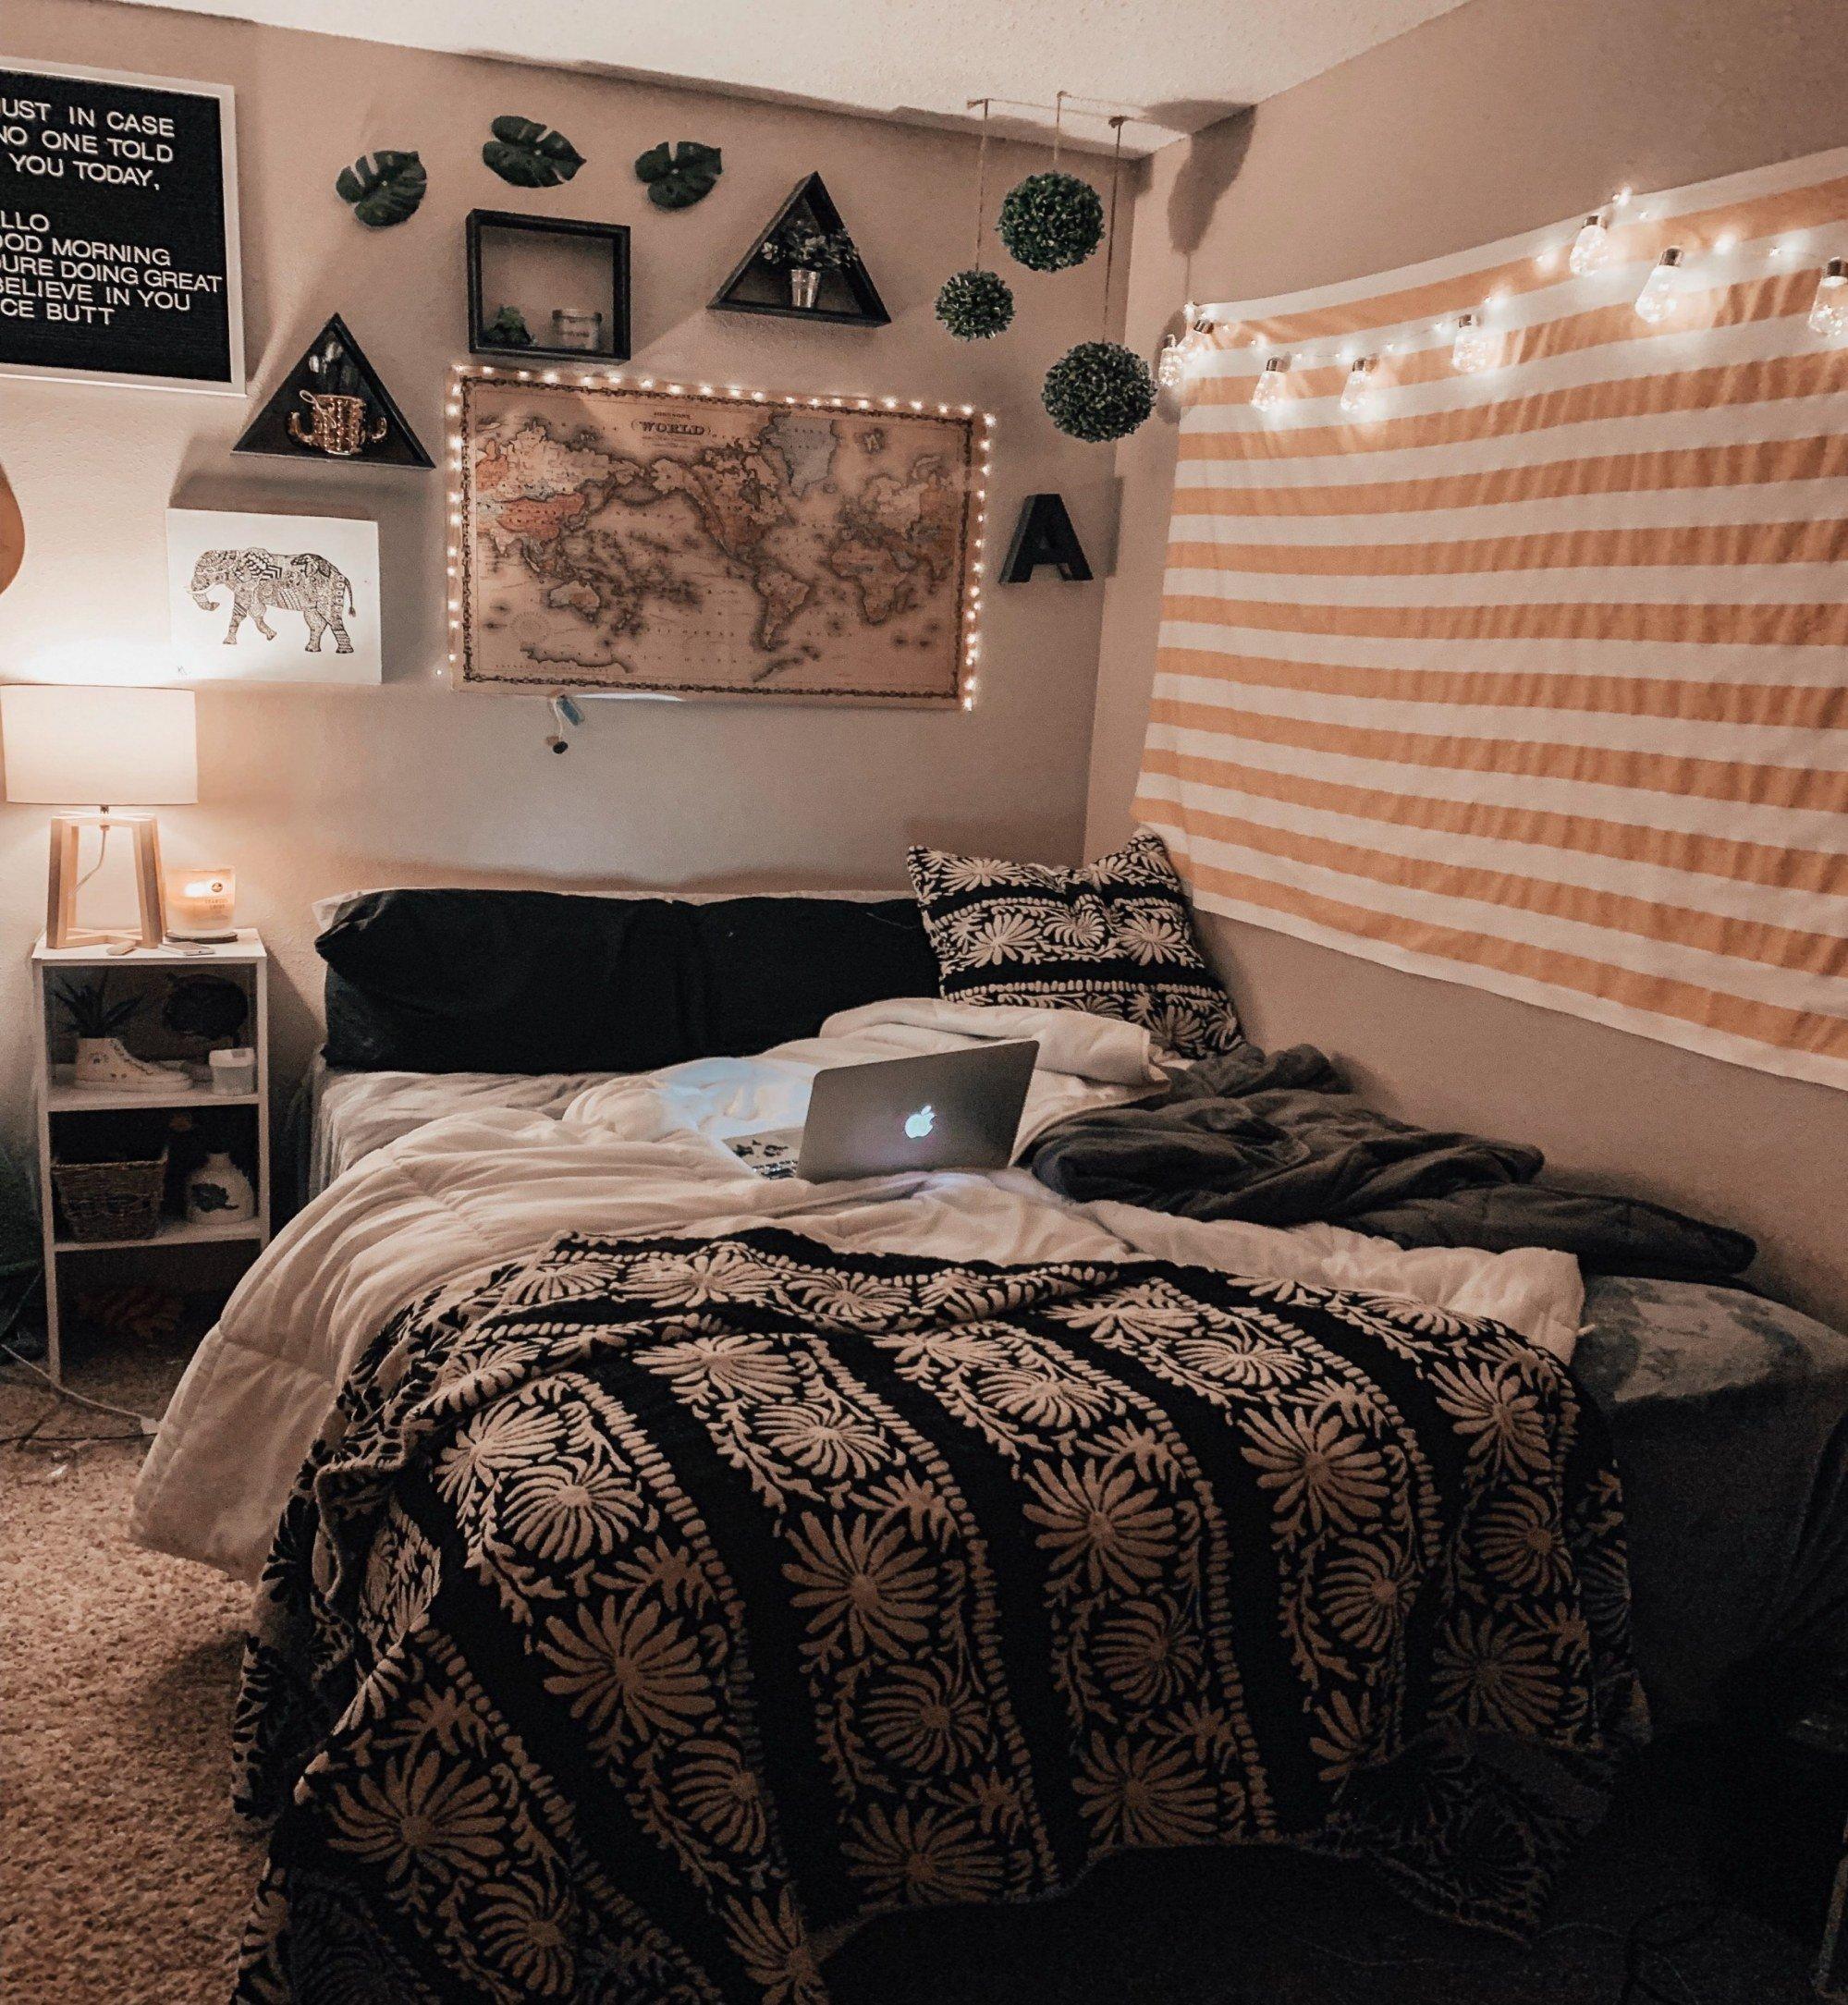 Girl Bedroom Decorating Ideas Lovely Blue Room Ideas Cute Room Ideas for Teenage Girl Room